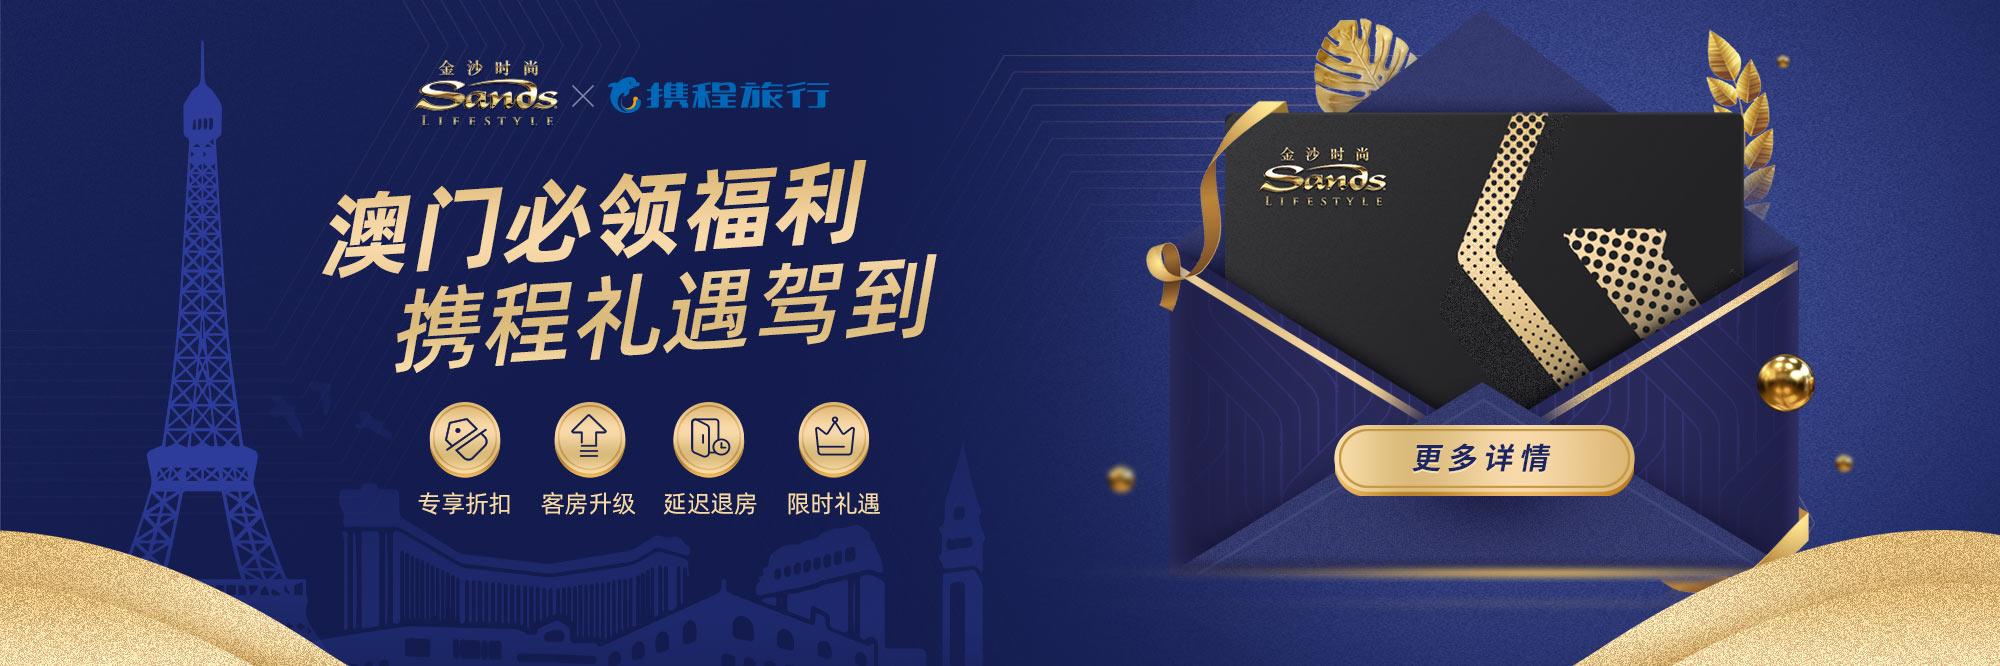 https://assets.sandsresortsmacao.cn/content/sale/flash-sale-2020/pc_cta-banner_2000x666_sc.jpg-------------https://www.sandsresortsmacao.com.cn/macau-offers/big-offer-2020.html